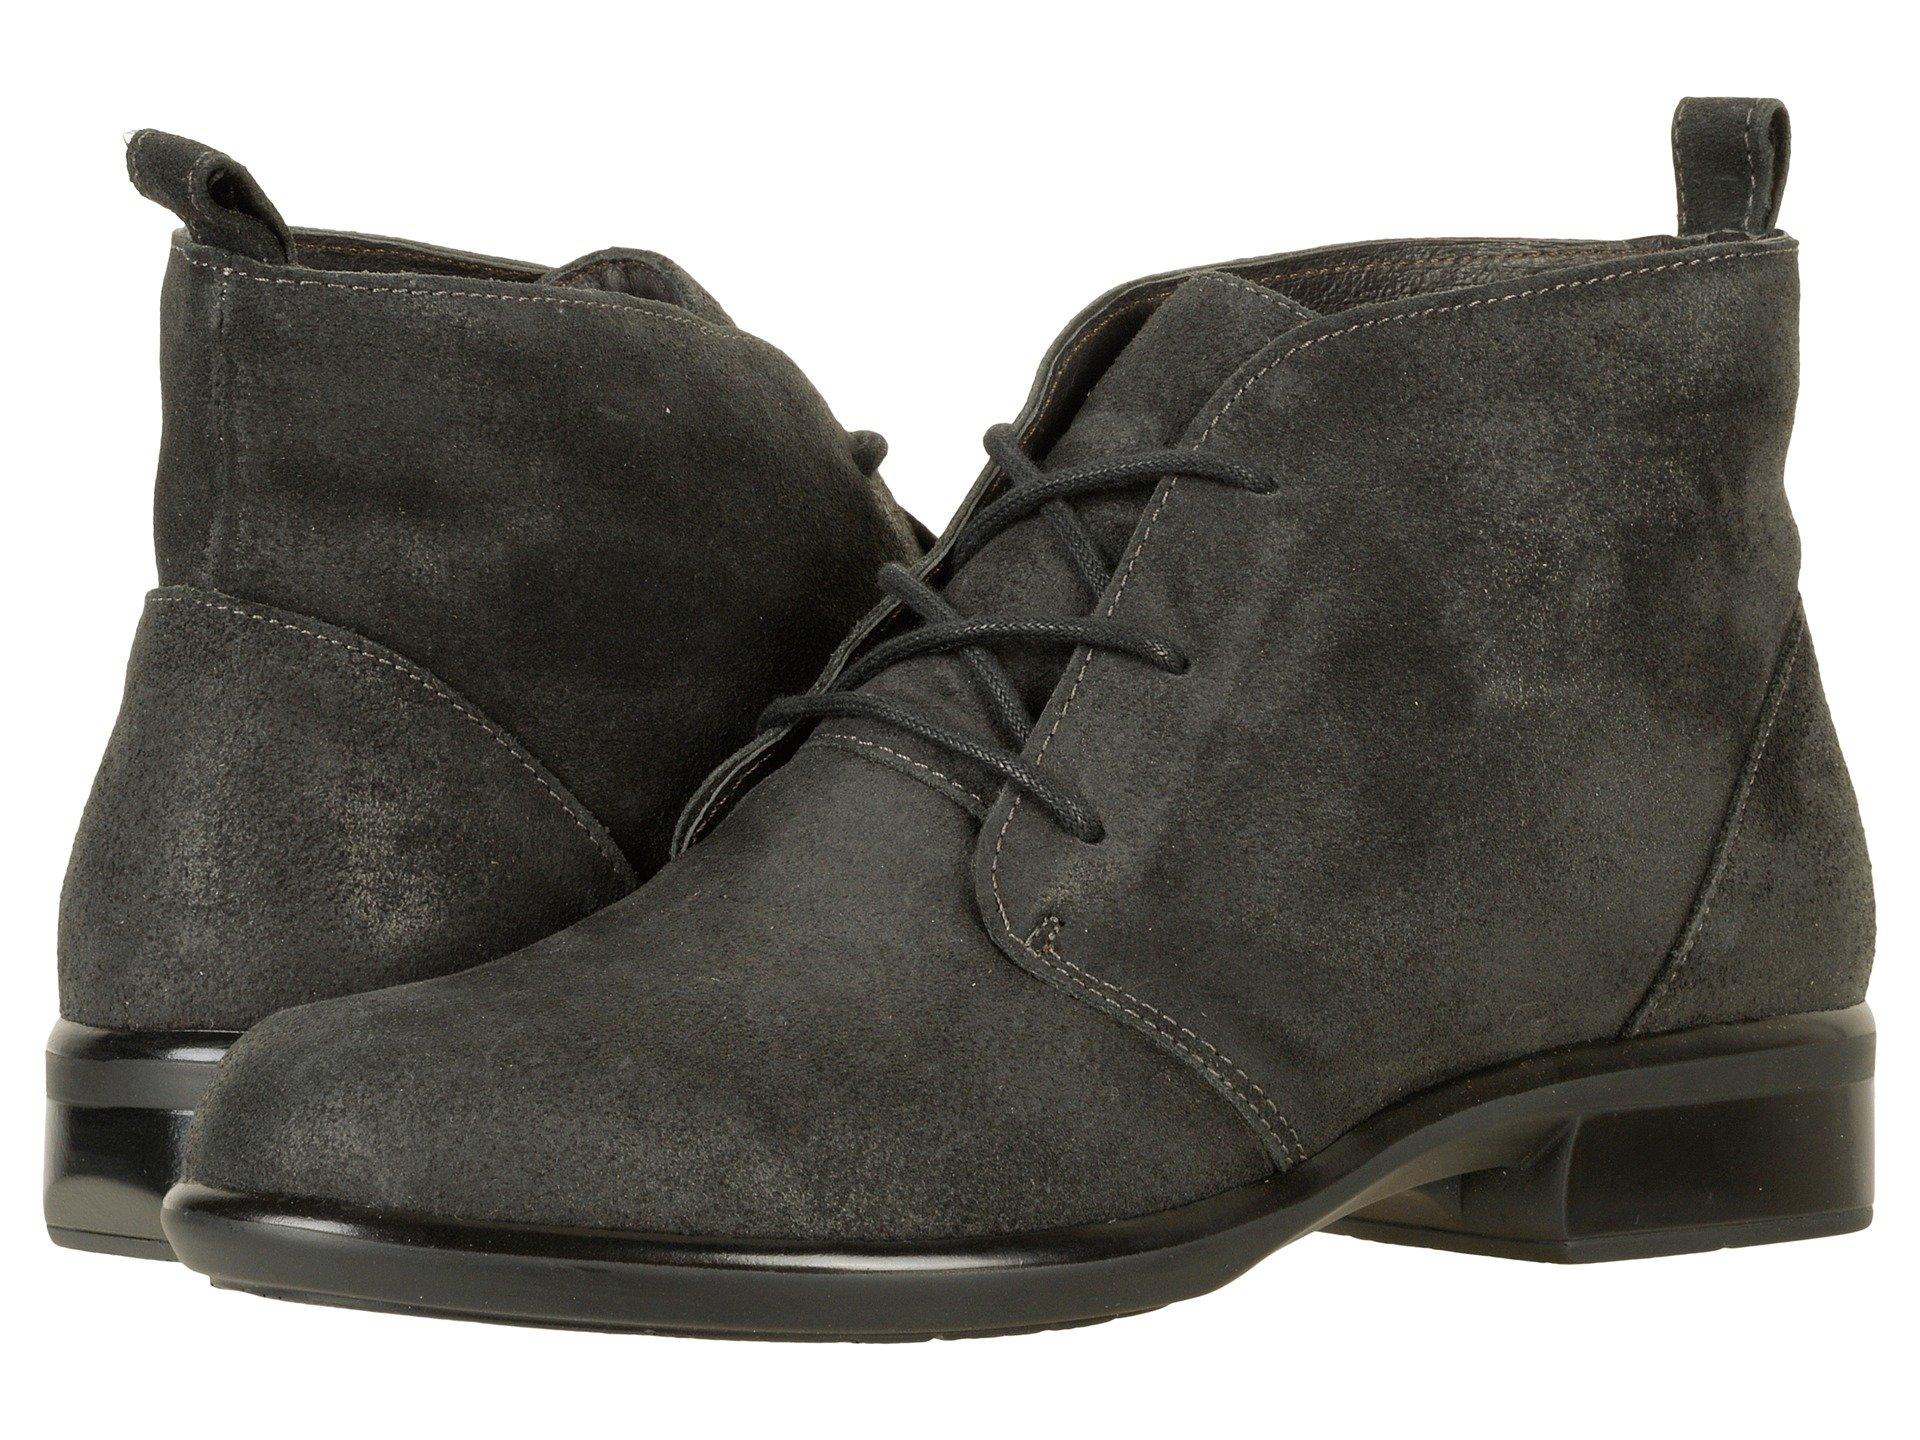 0be5c235e9e5b Women's Chukka Boots + FREE SHIPPING | Shoes | Zappos.com